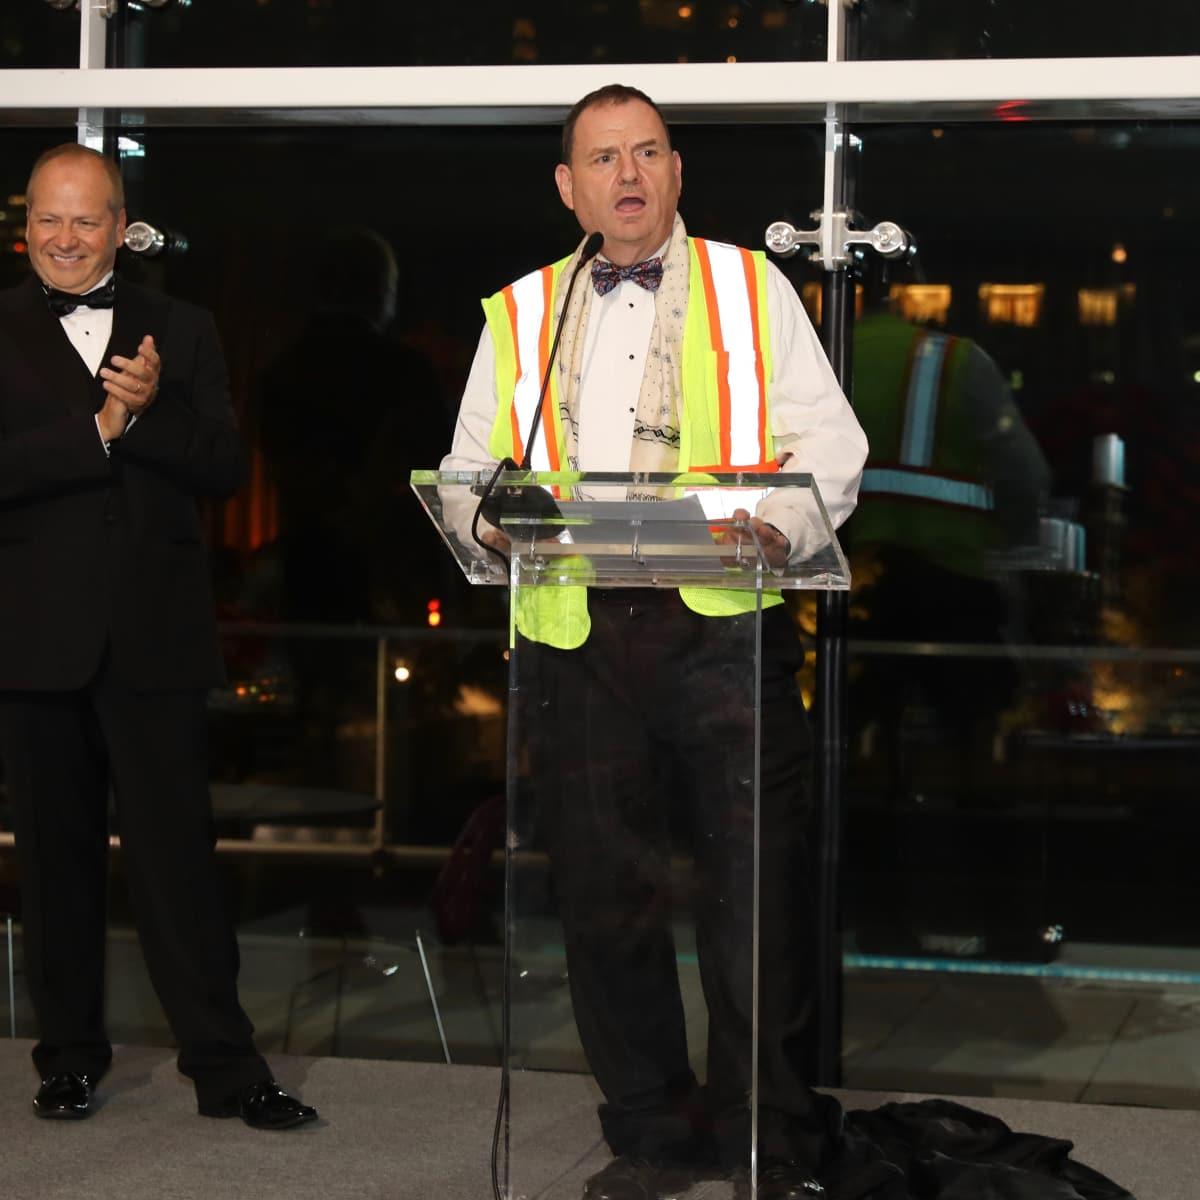 Patrick Summers, Perryn Leech at Houston Grand Opera opening night 2017